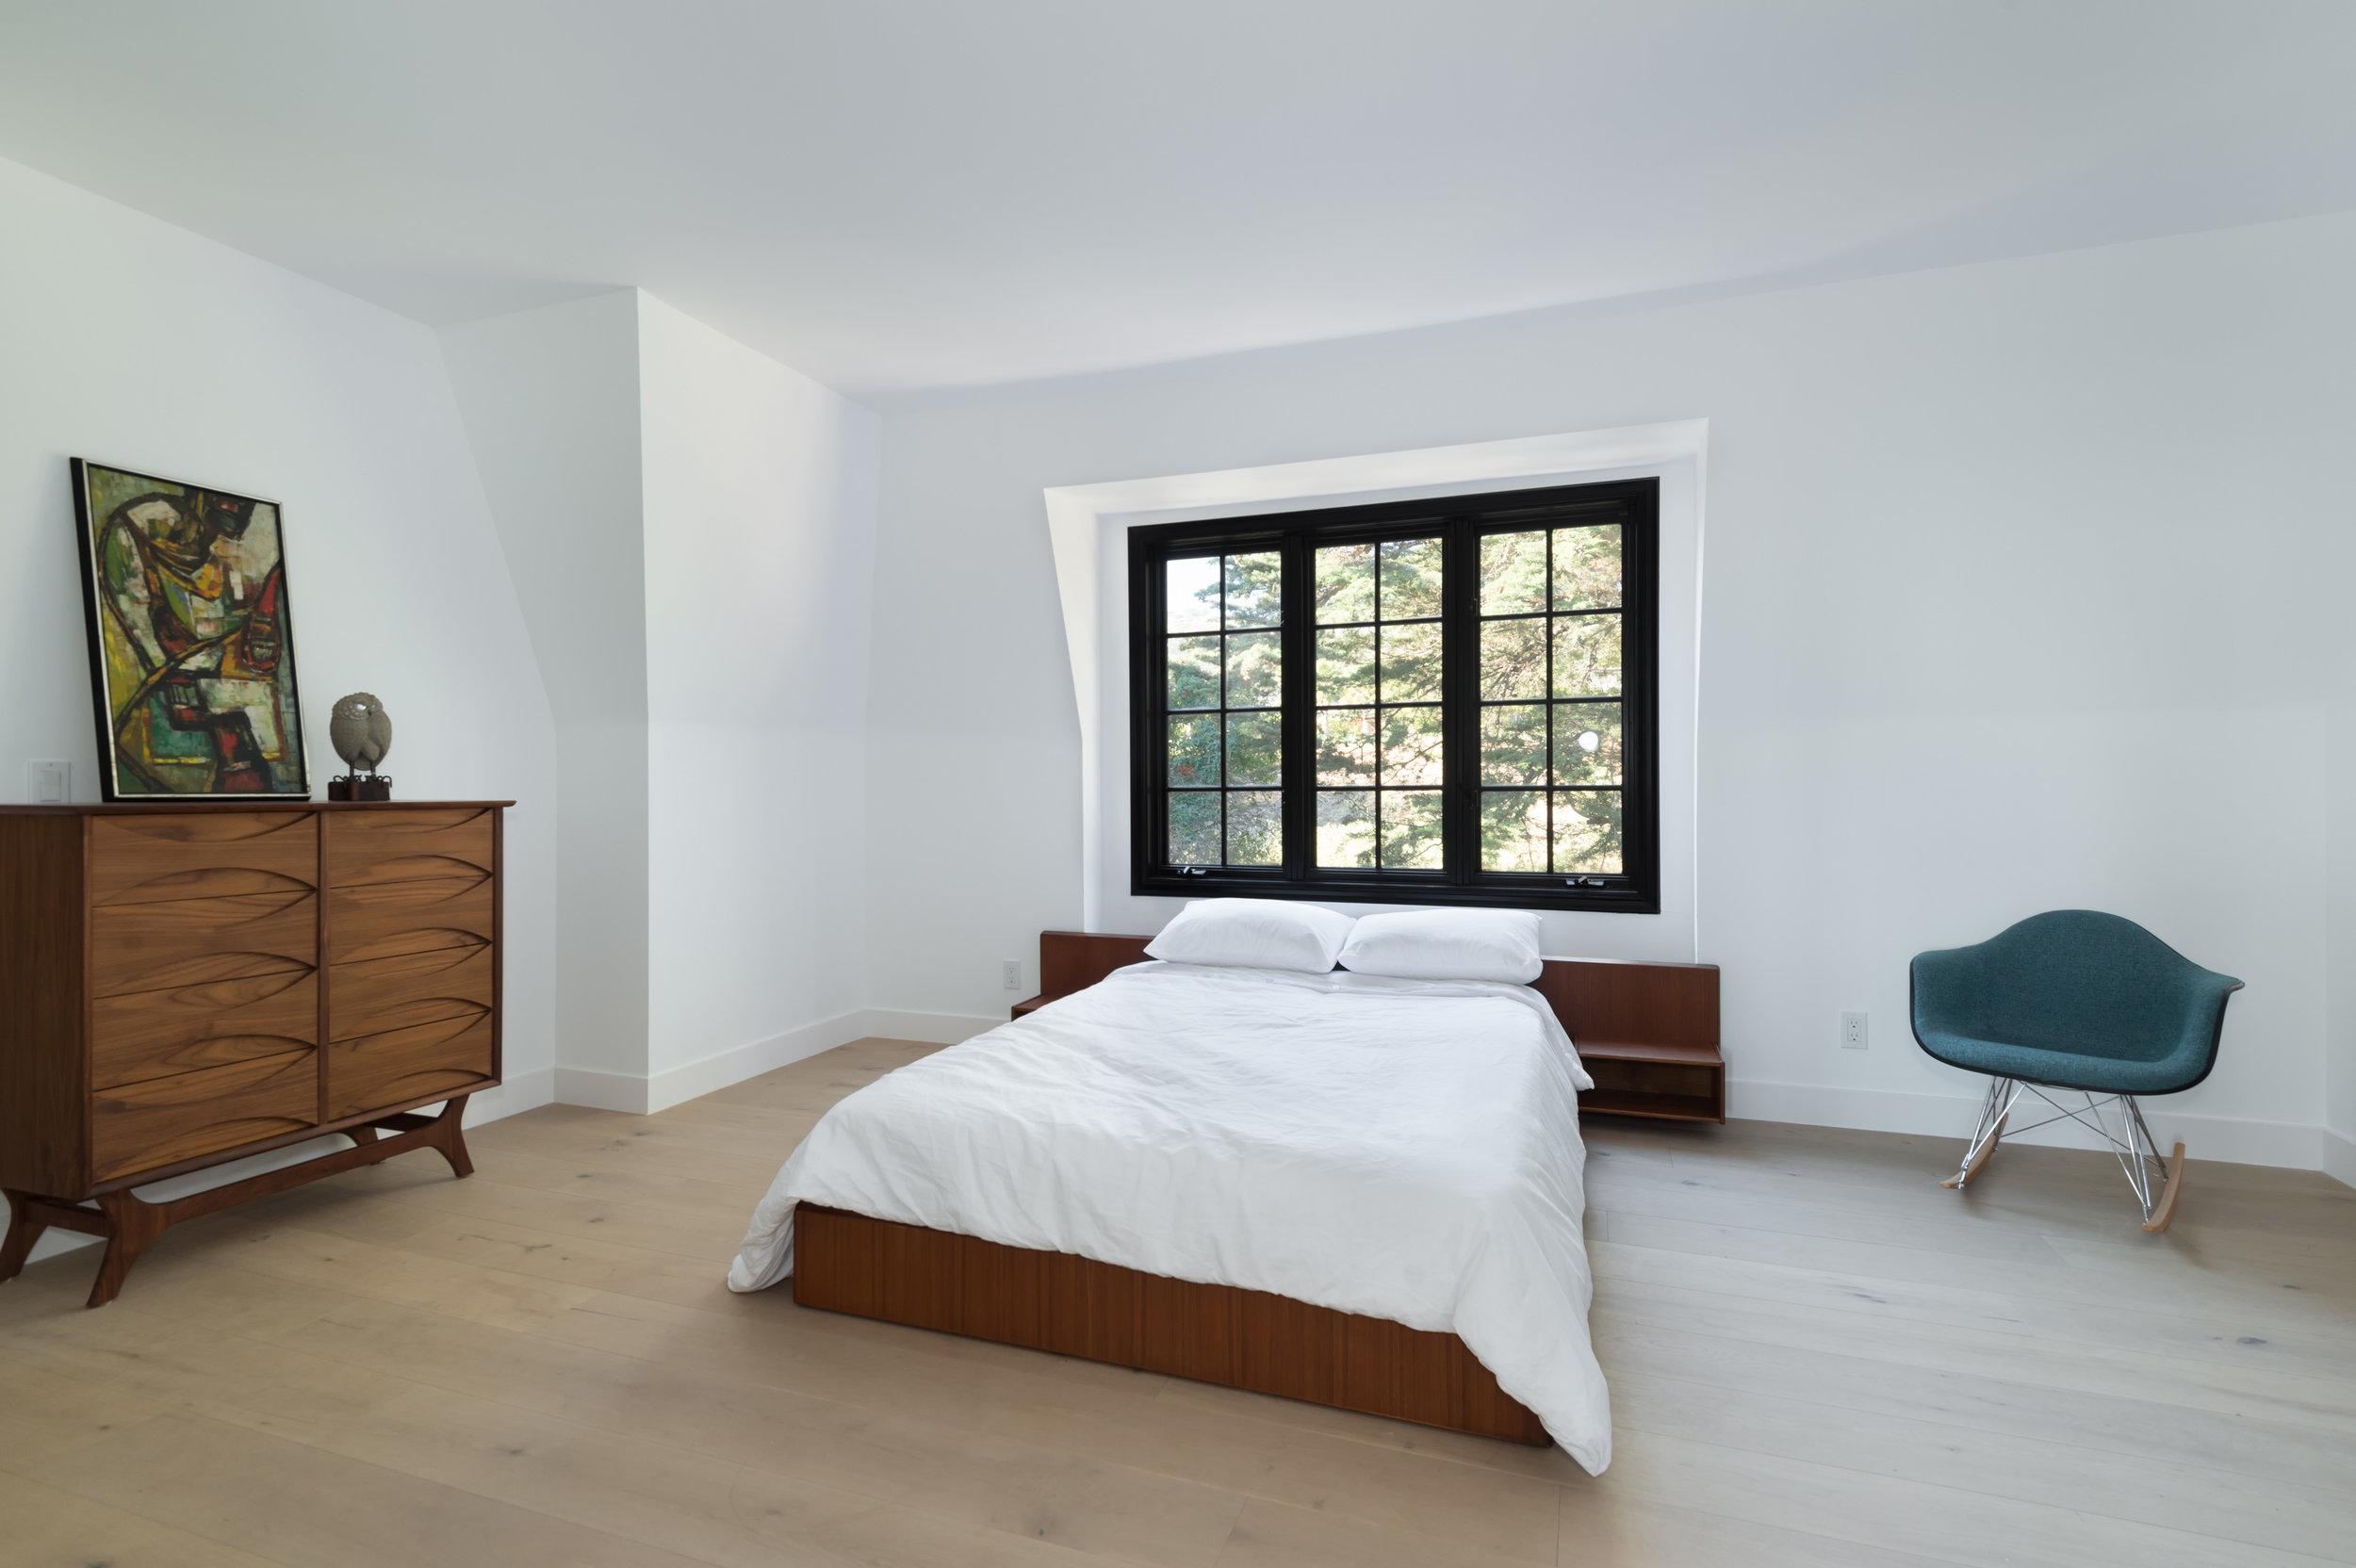 018 bedroom 30340 Morning View Malibu For Sale The Malibu Life Team Luxury Real Estate.jpg